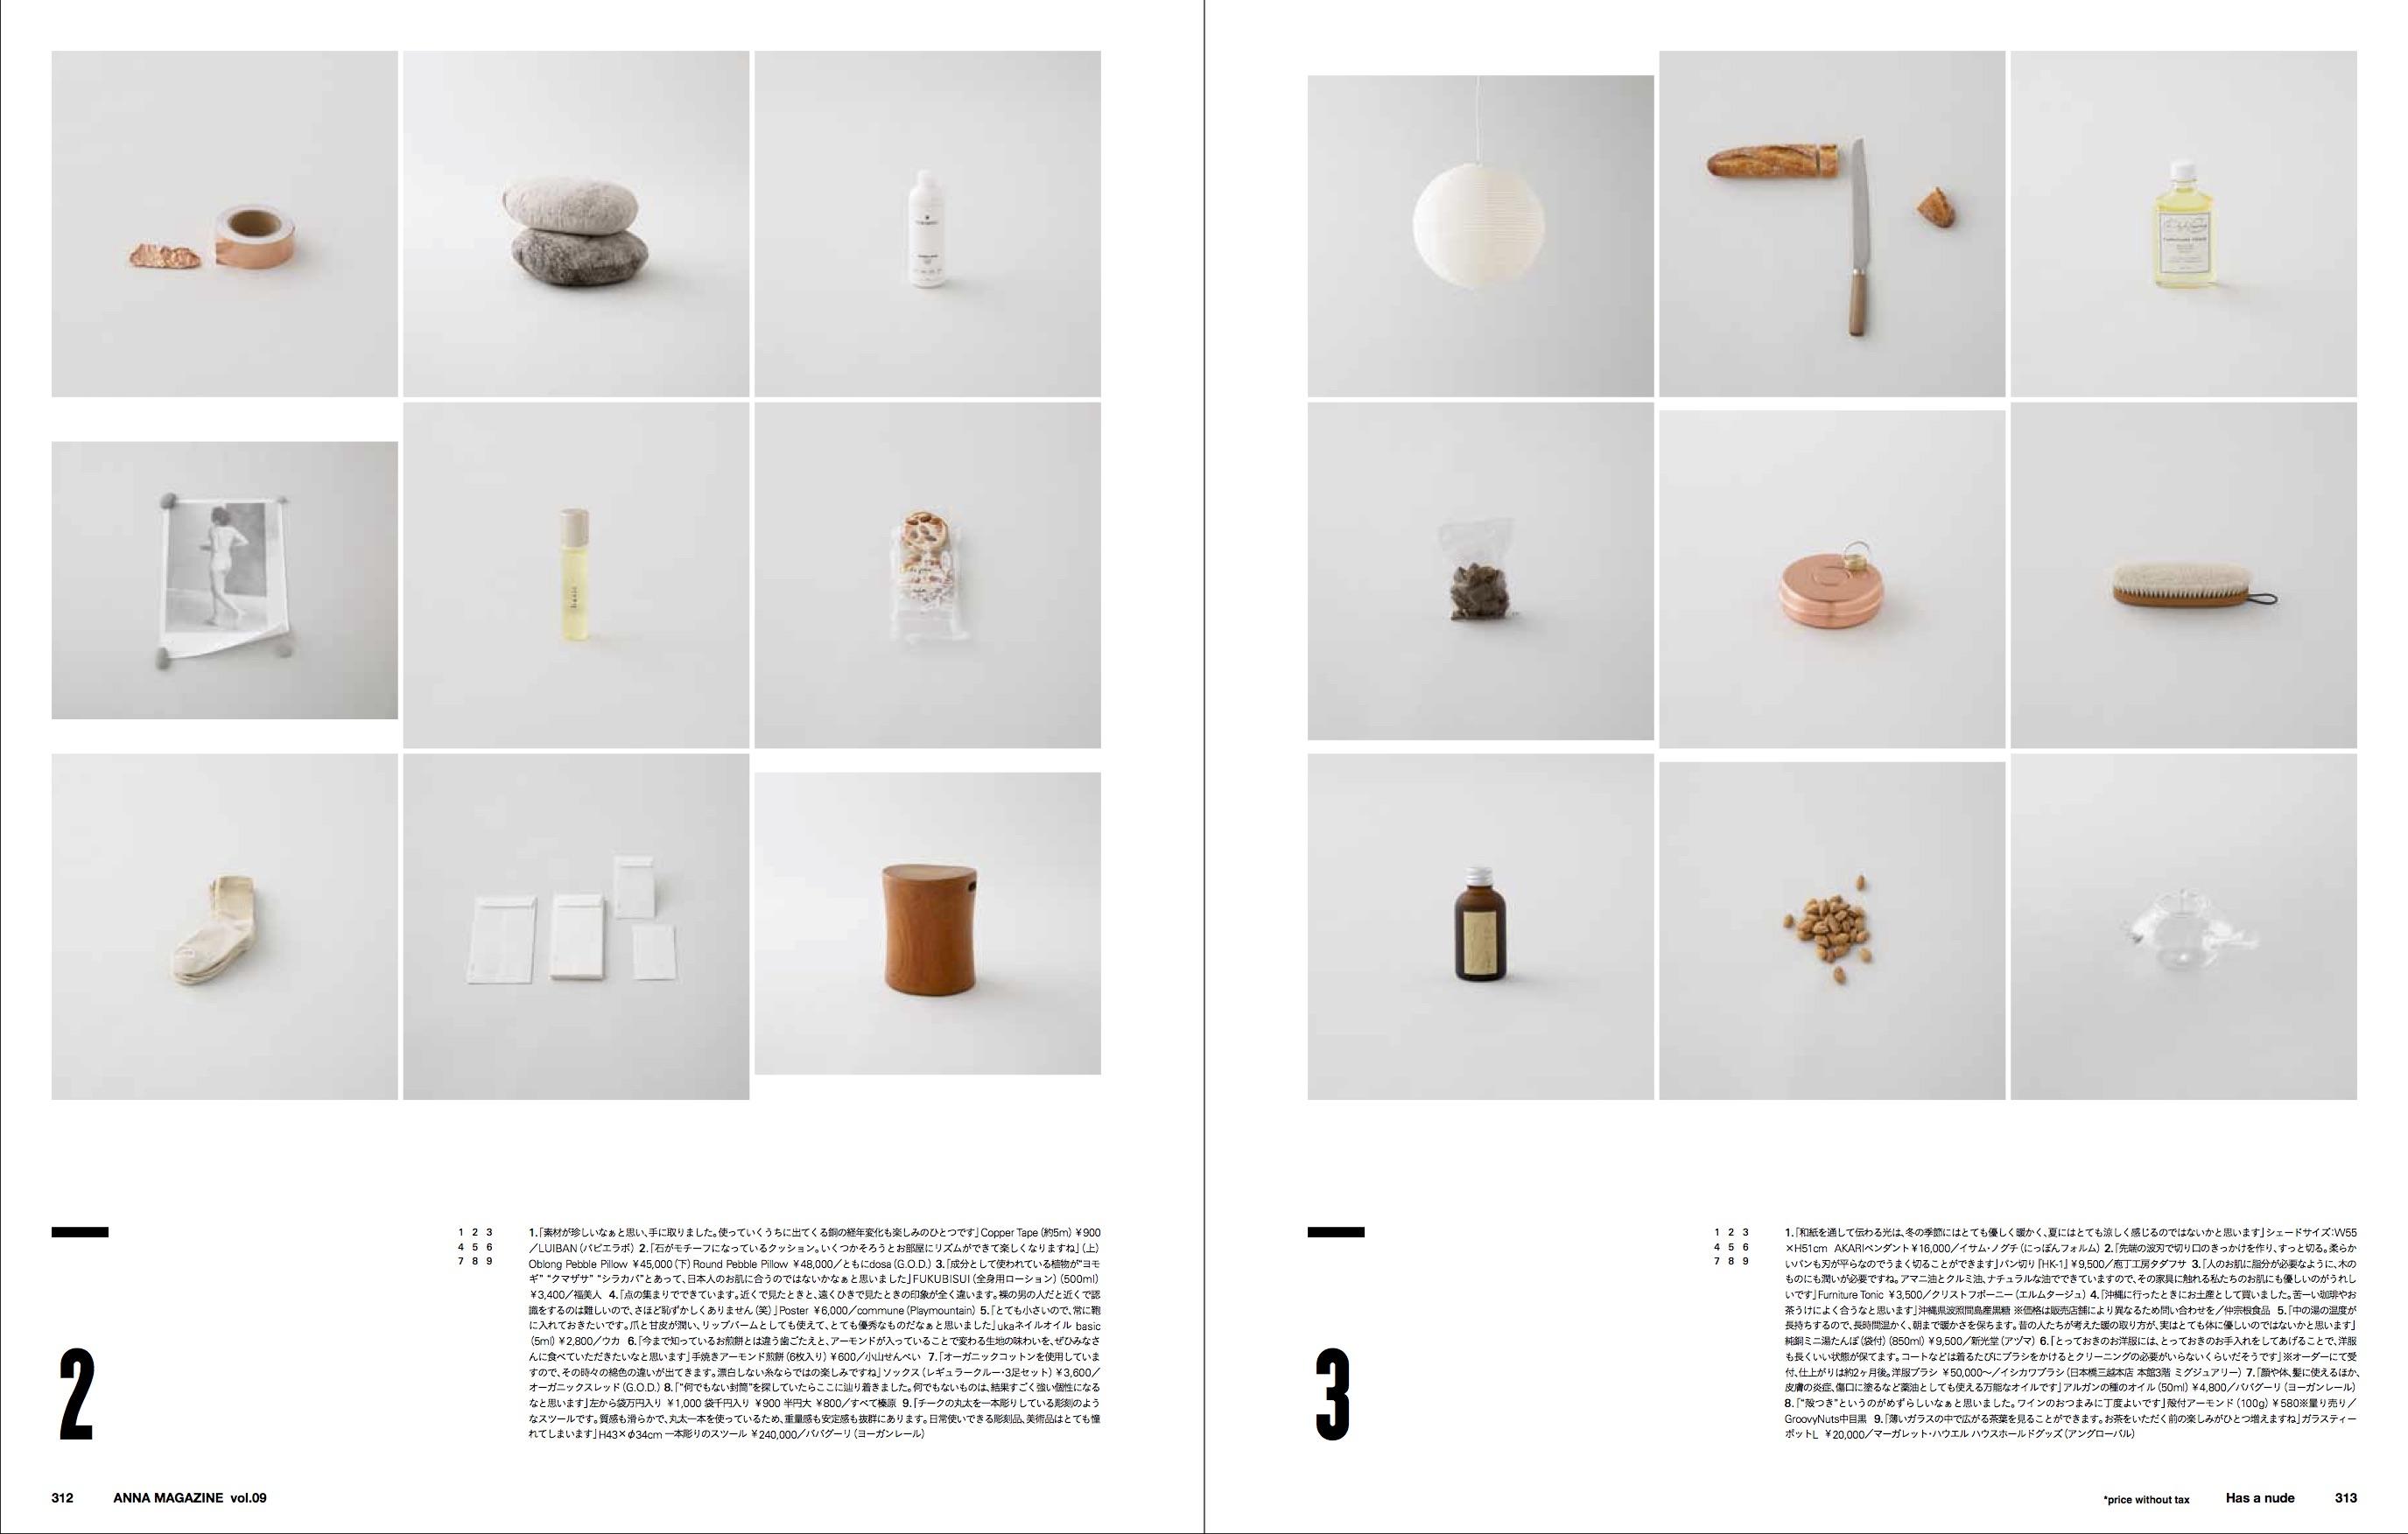 anna magazine vol.9 P152